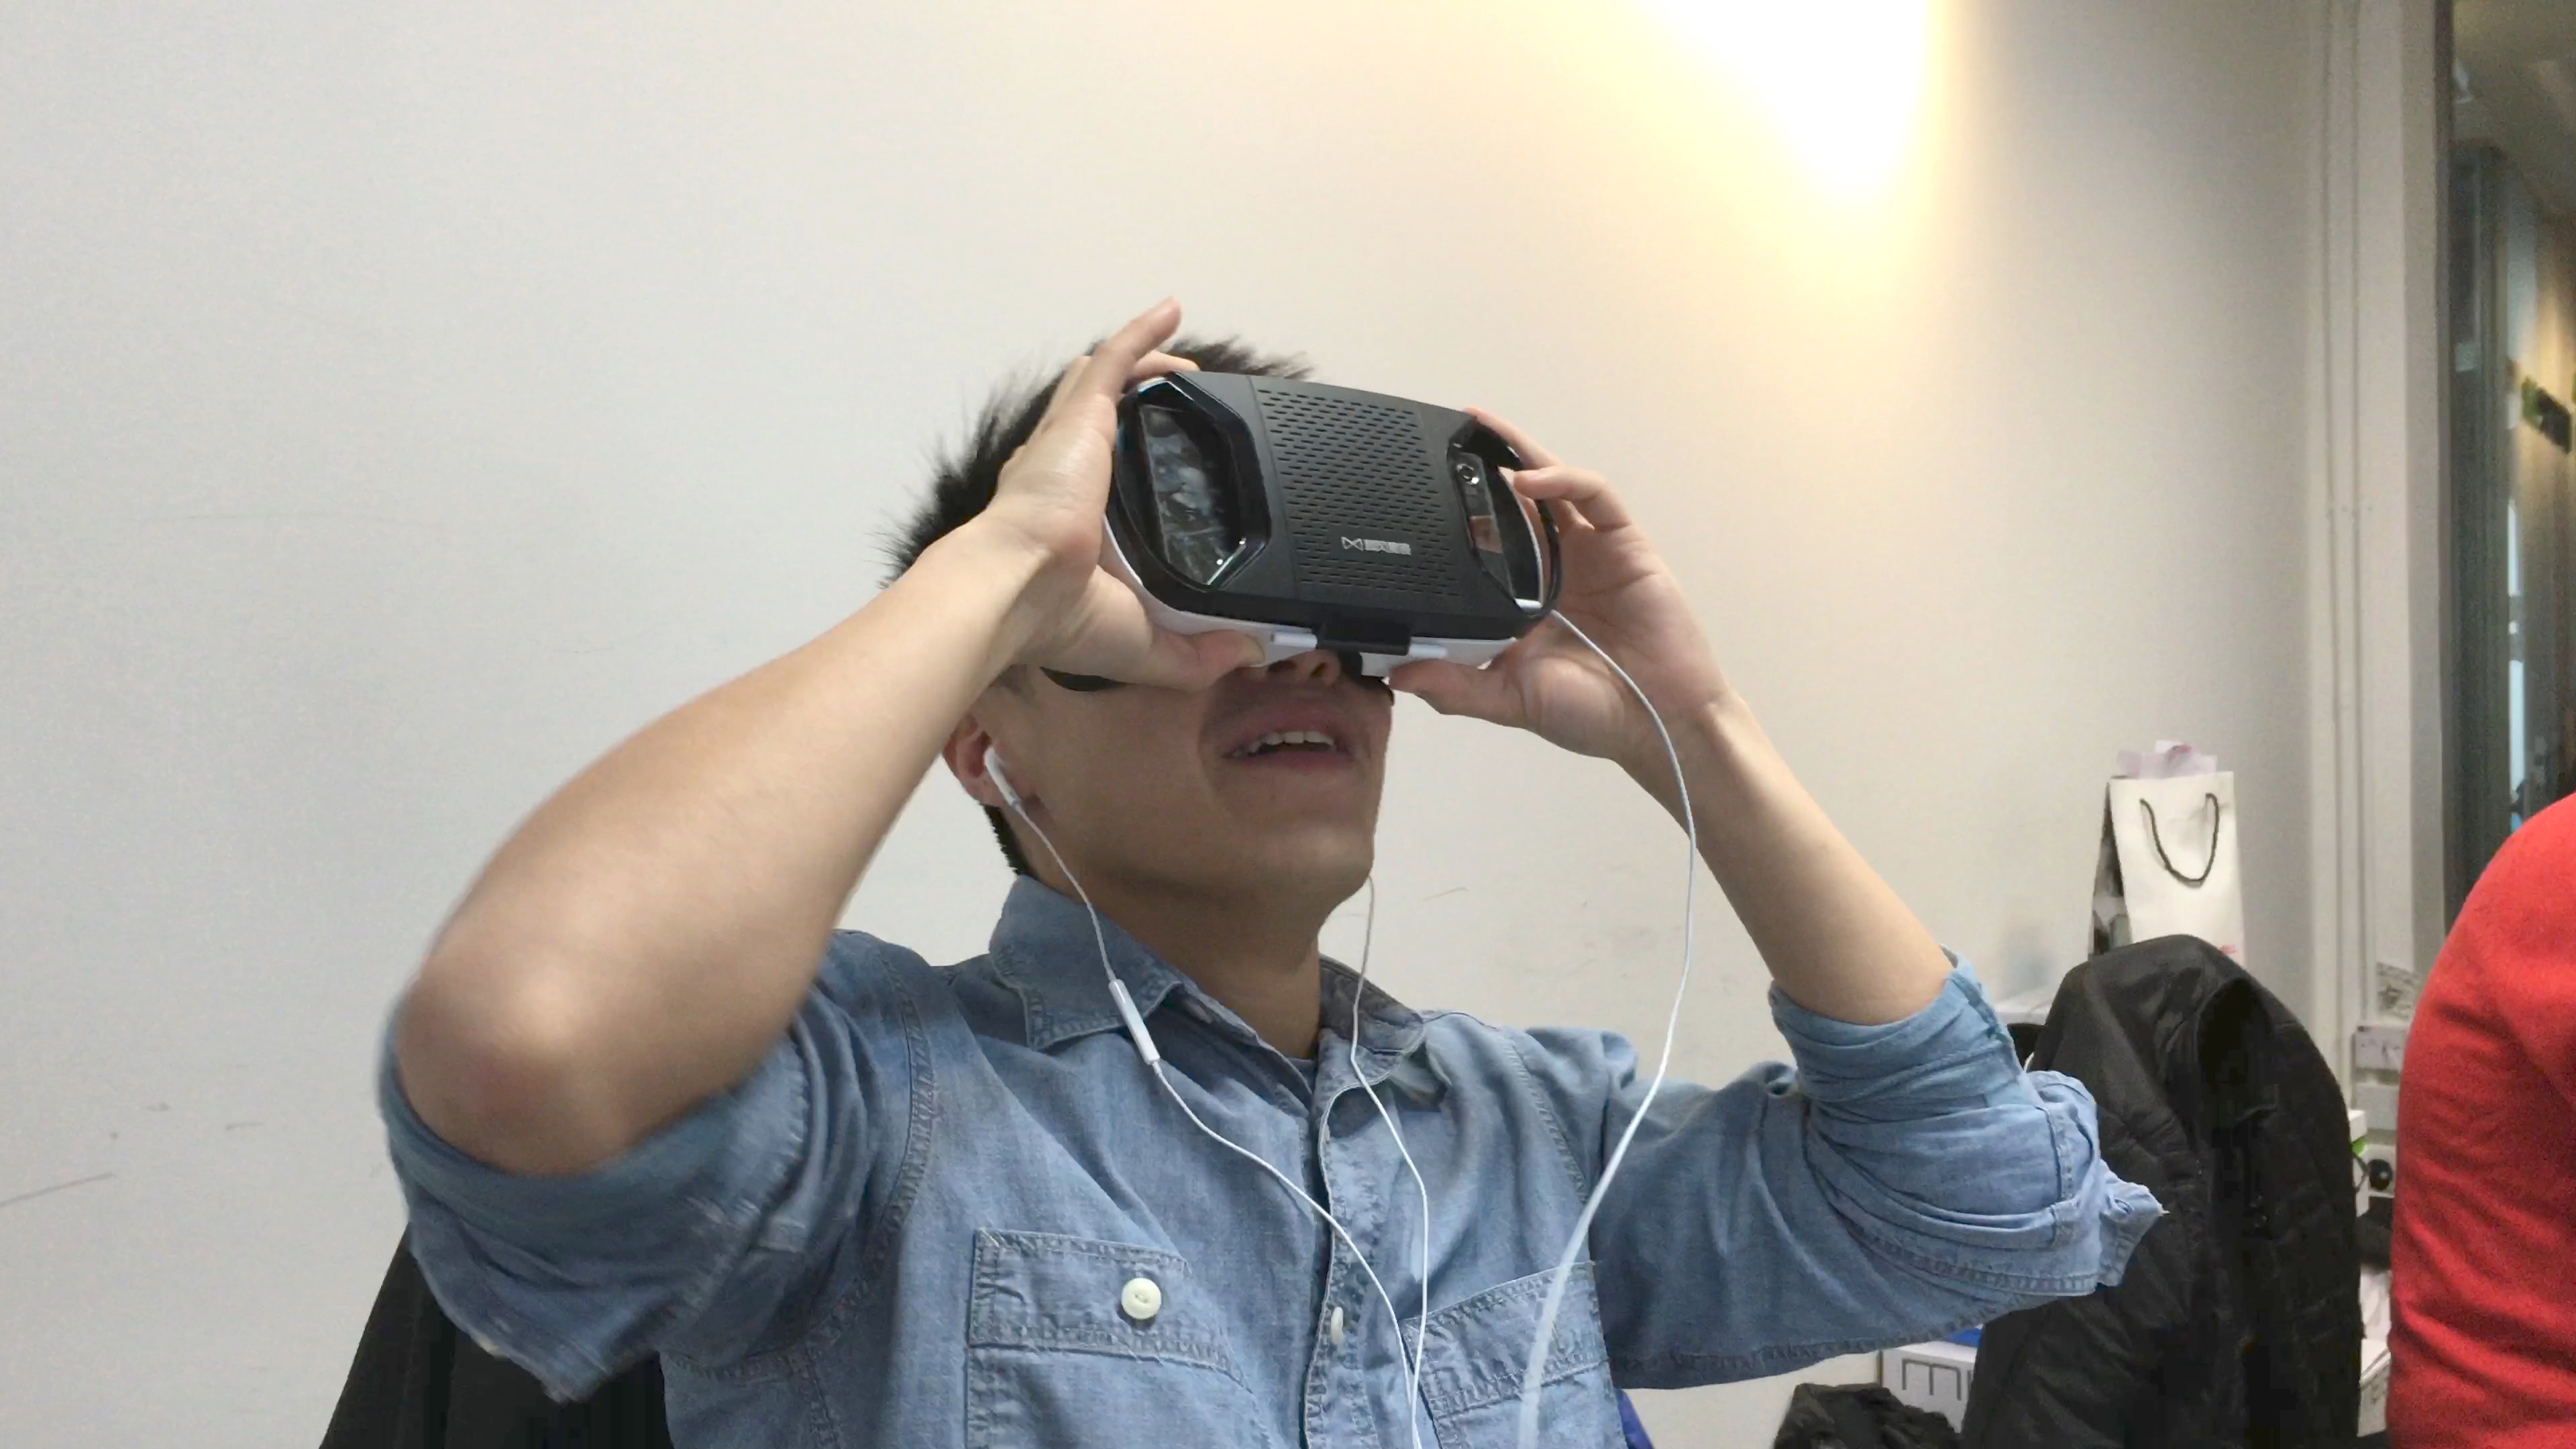 Pornhub 推出 VR 成人電影頻道 : 免費任睇 + 安裝及 VR 選購教學